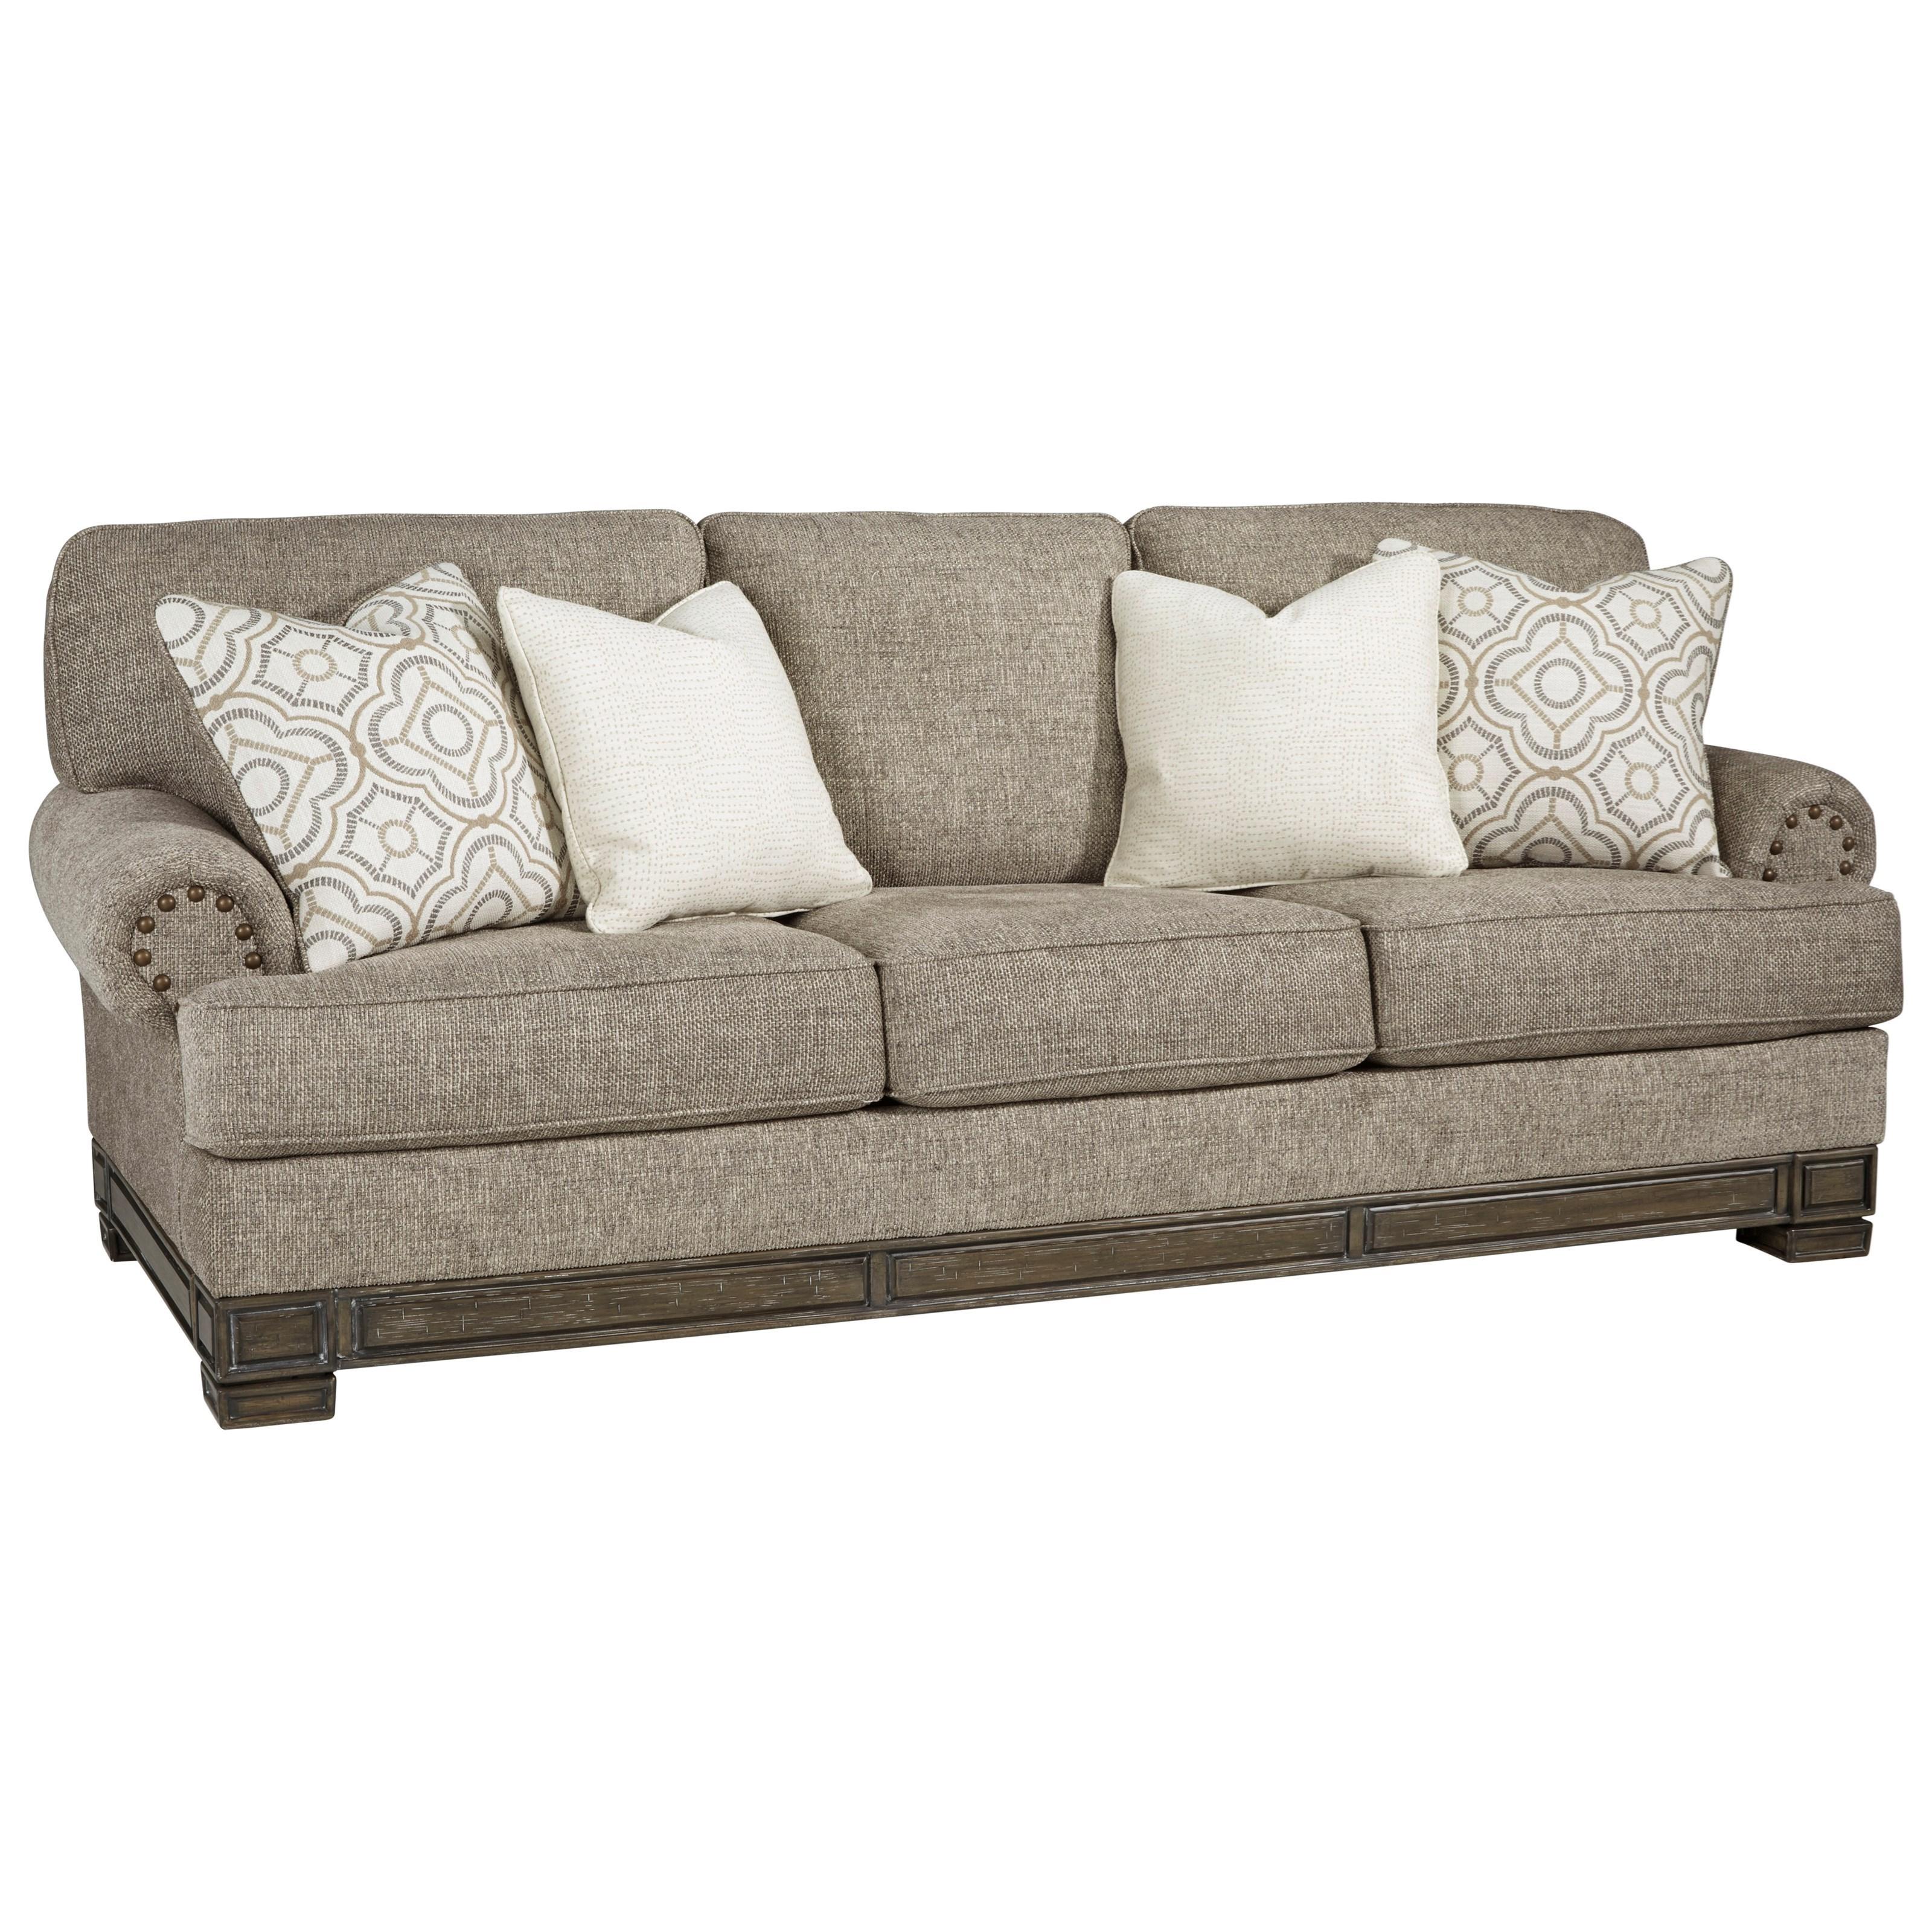 Einsgrove Sofa by Ashley (Signature Design) at Johnny Janosik